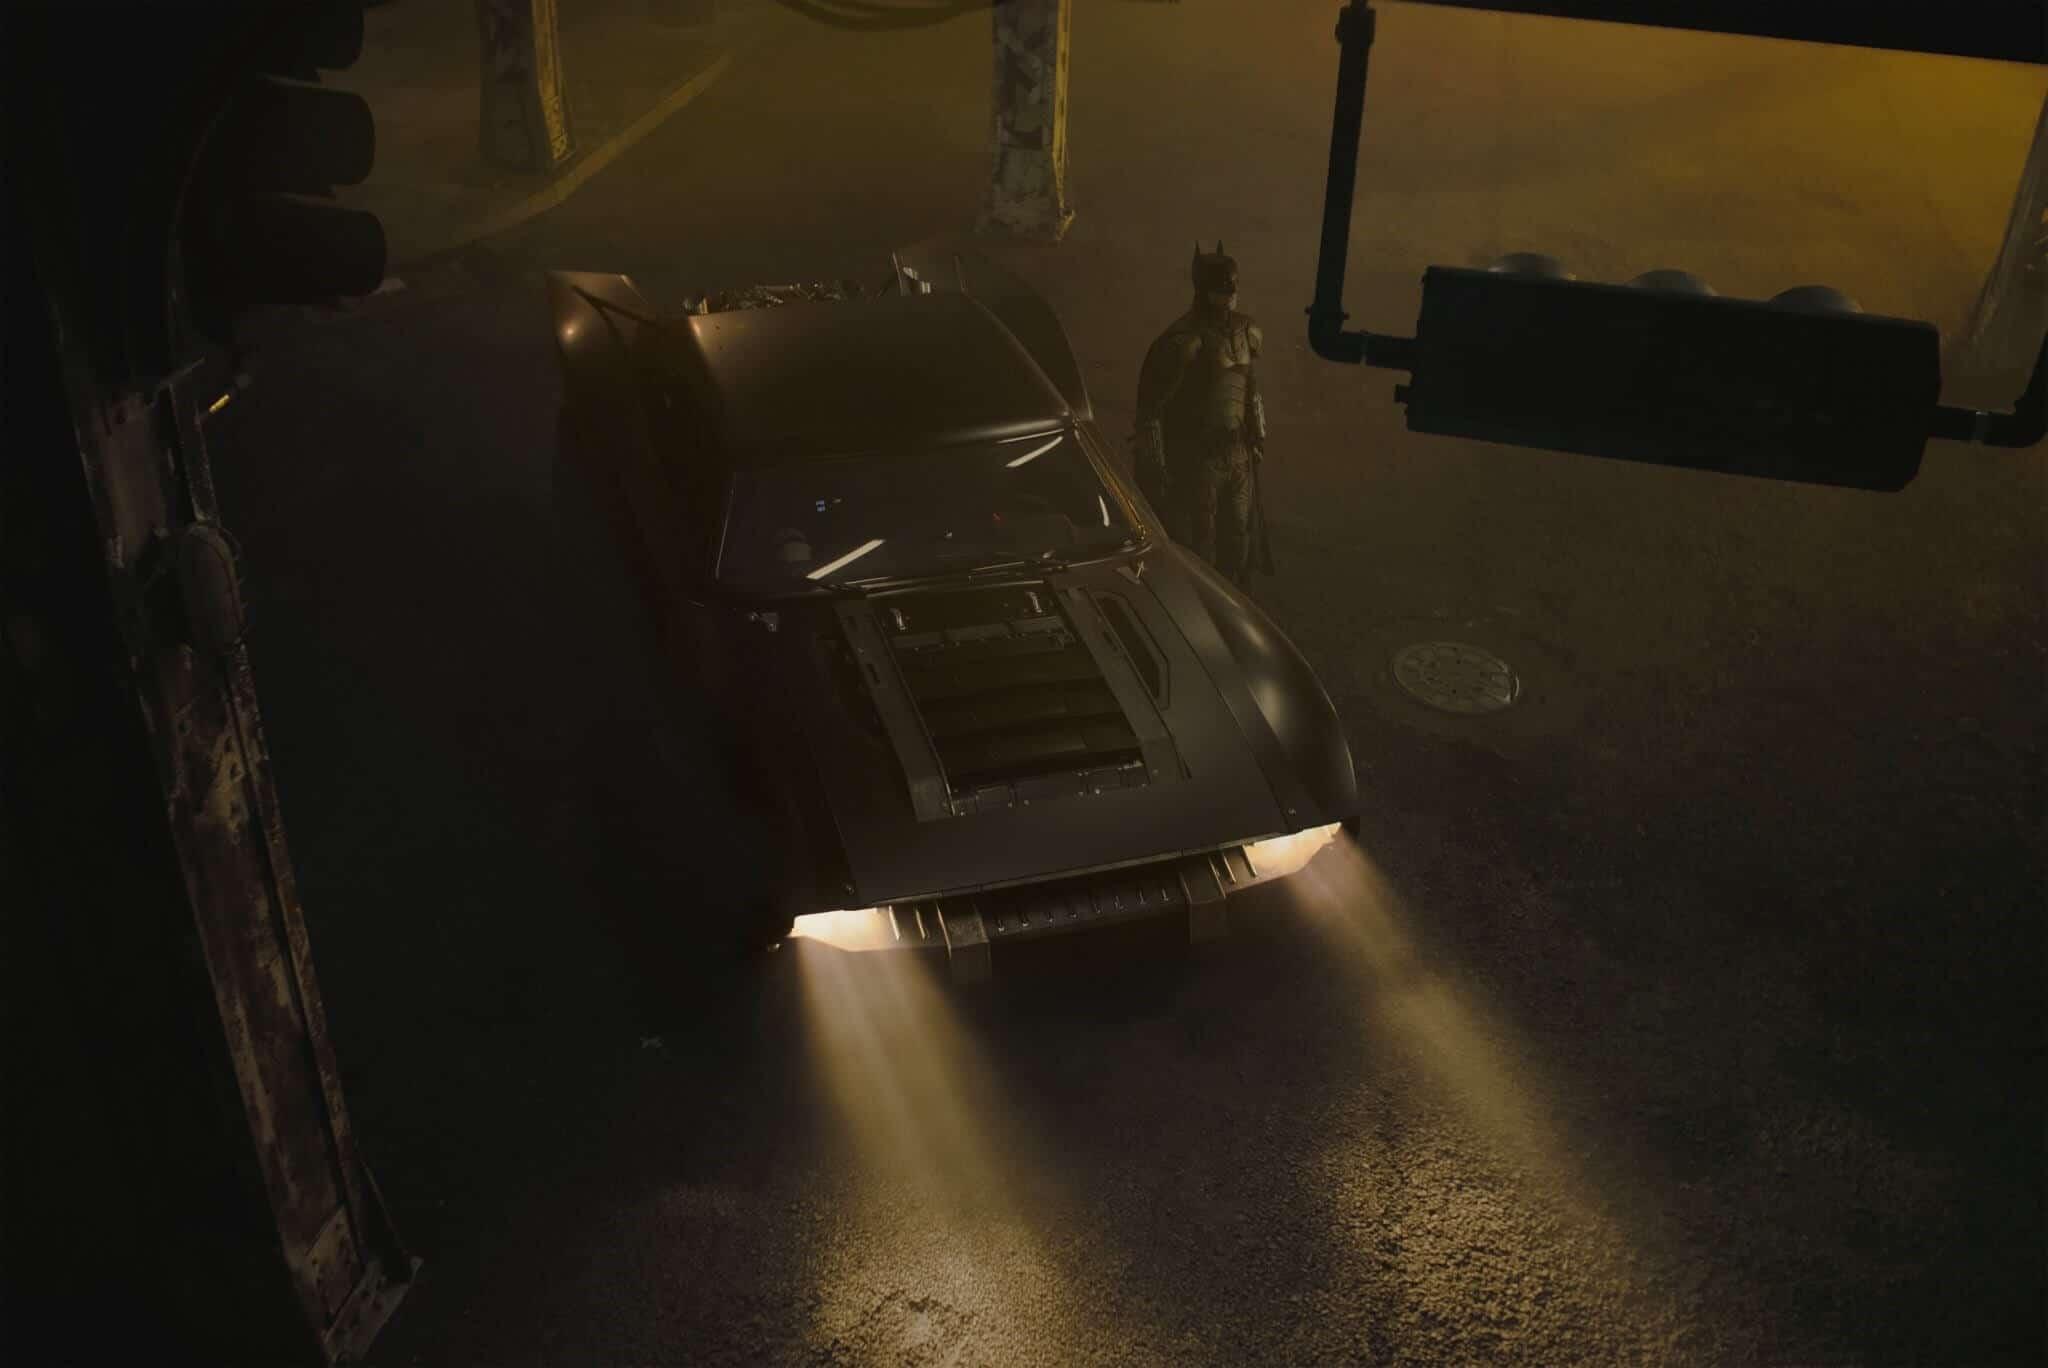 The Batman Cast, Set Photos, Release Date and What We Know So Far - The Batman 2021 - Batmobile